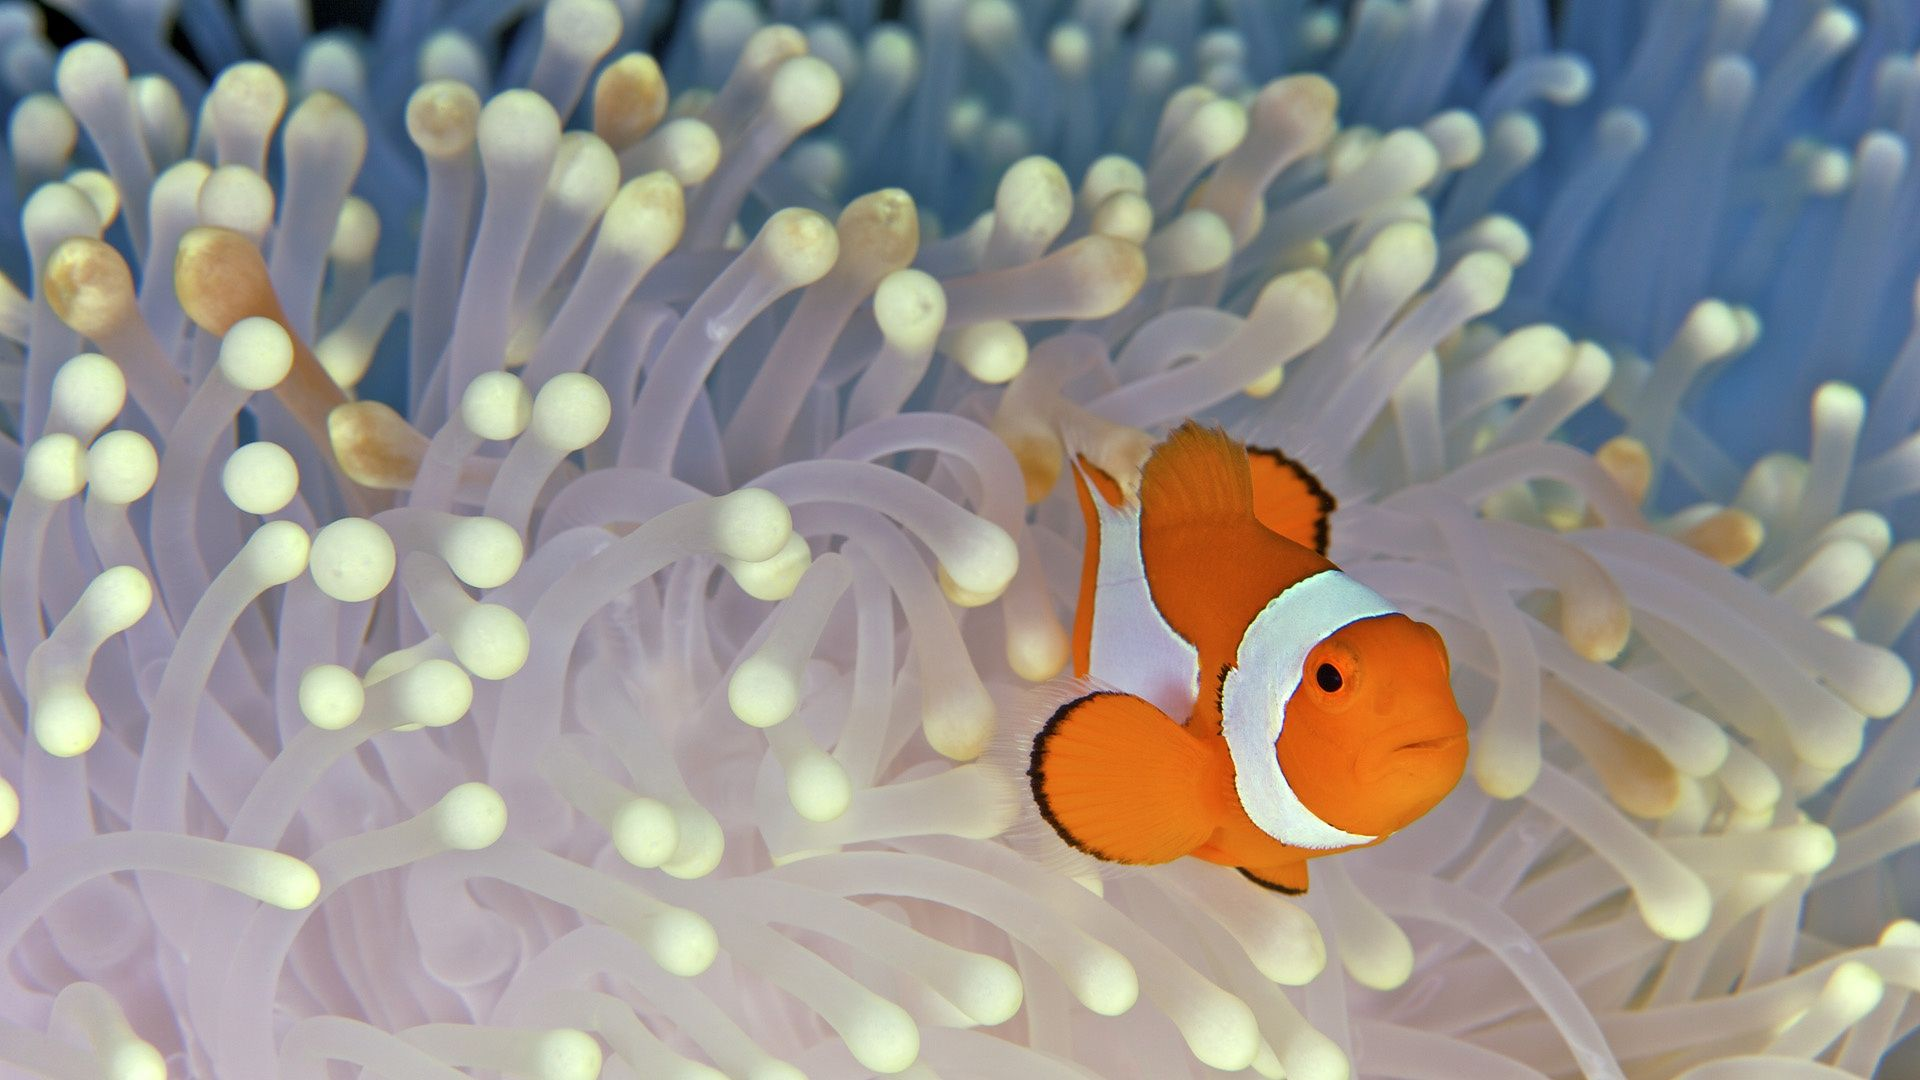 Clown Fish Wallpapers Fish Wallpaper Clown Fish Fish